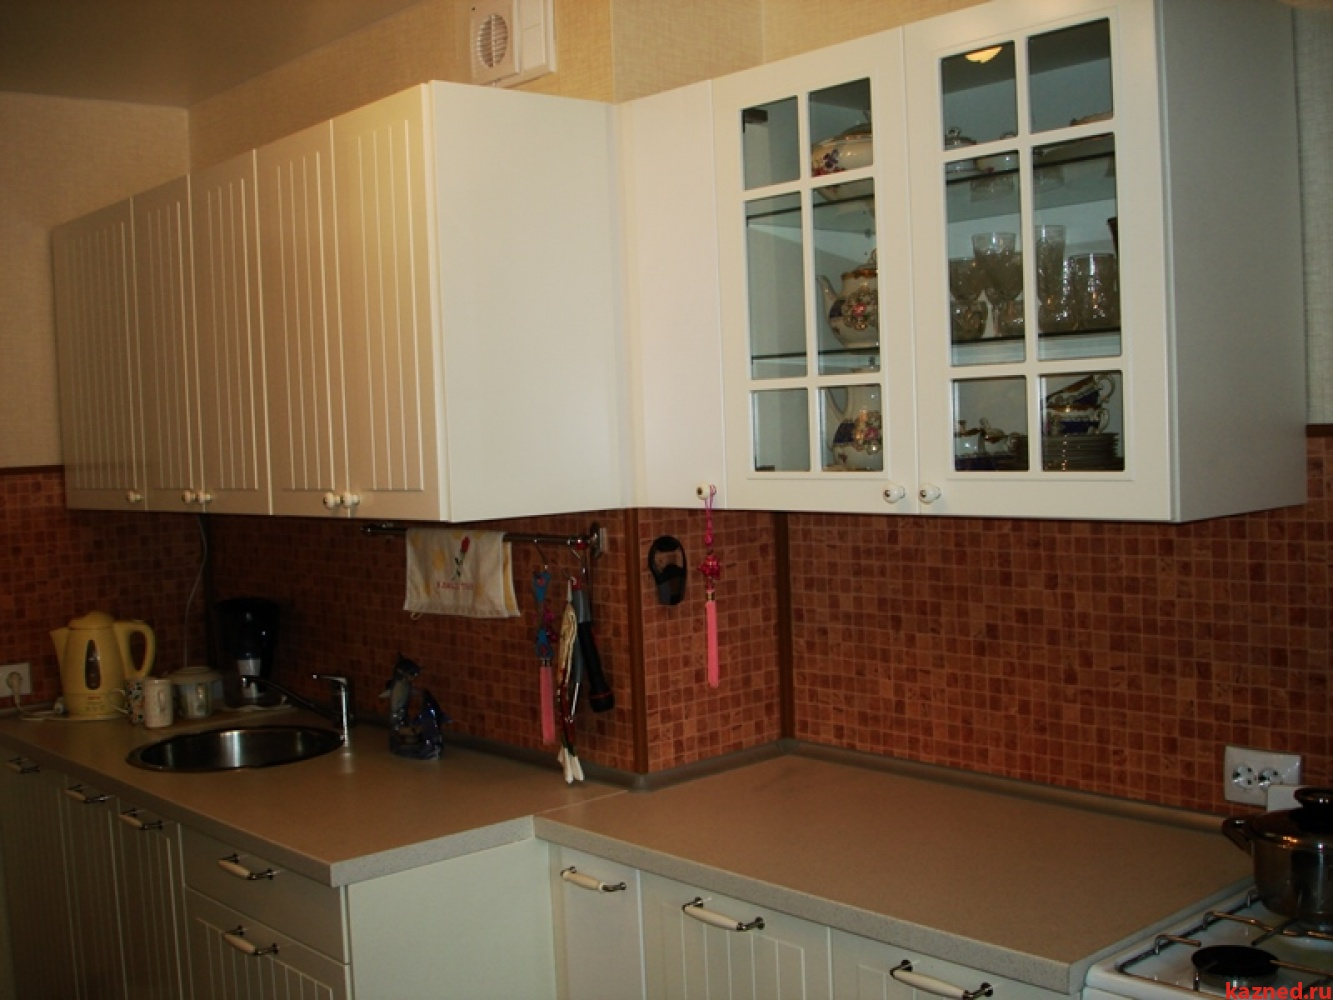 Продам 1-комн.квартиру Безоблачная, 6а, 50 м2  (миниатюра №13)